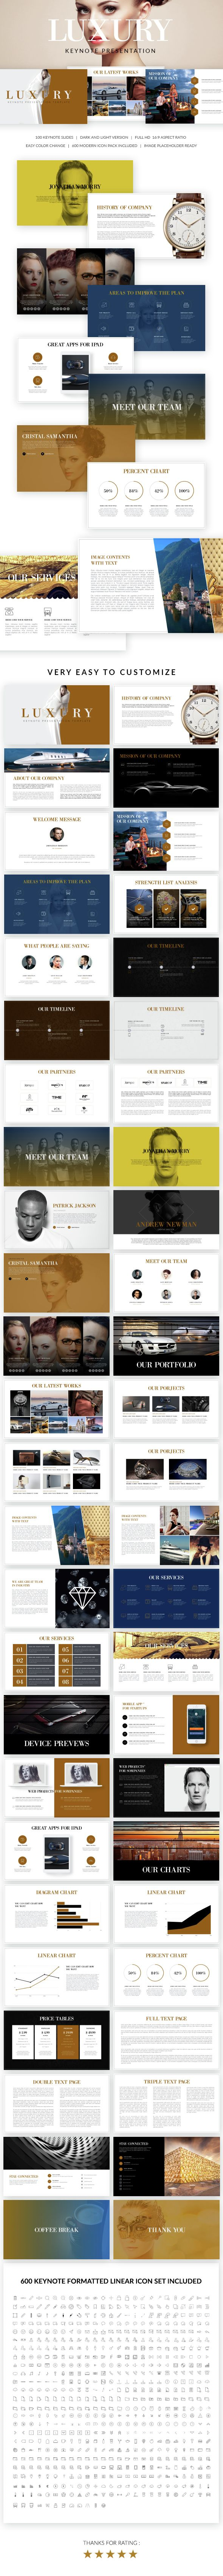 Luxury Keynote Presentation Template. Download here: http://graphicriver.net/item/luxury-keynote-presentation-template/15218825?ref=ksioks